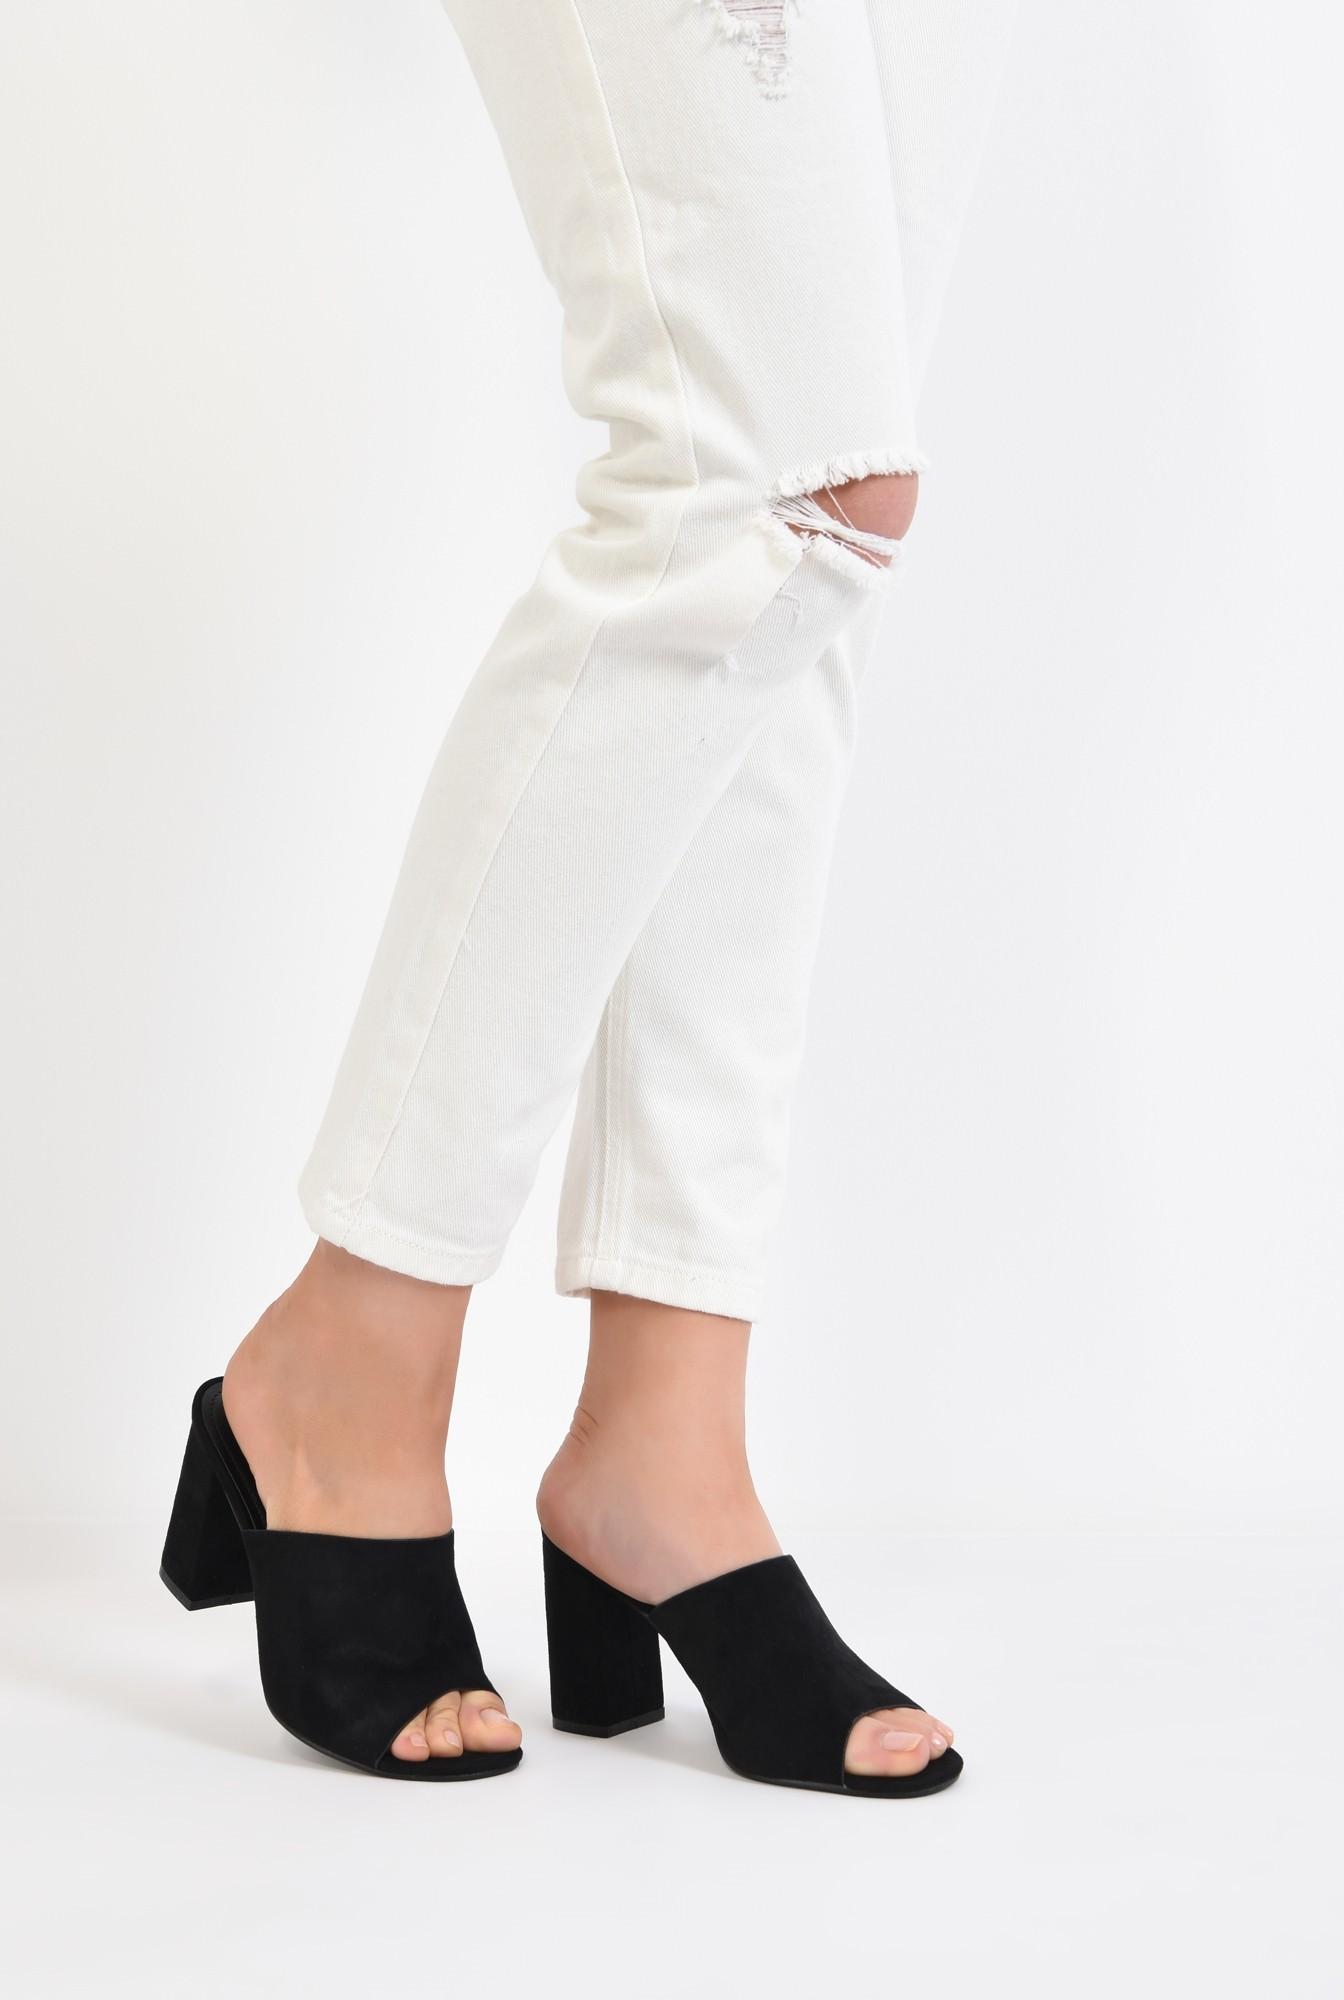 4 - saboti, negru, toc gros, varf decupat, sandale online